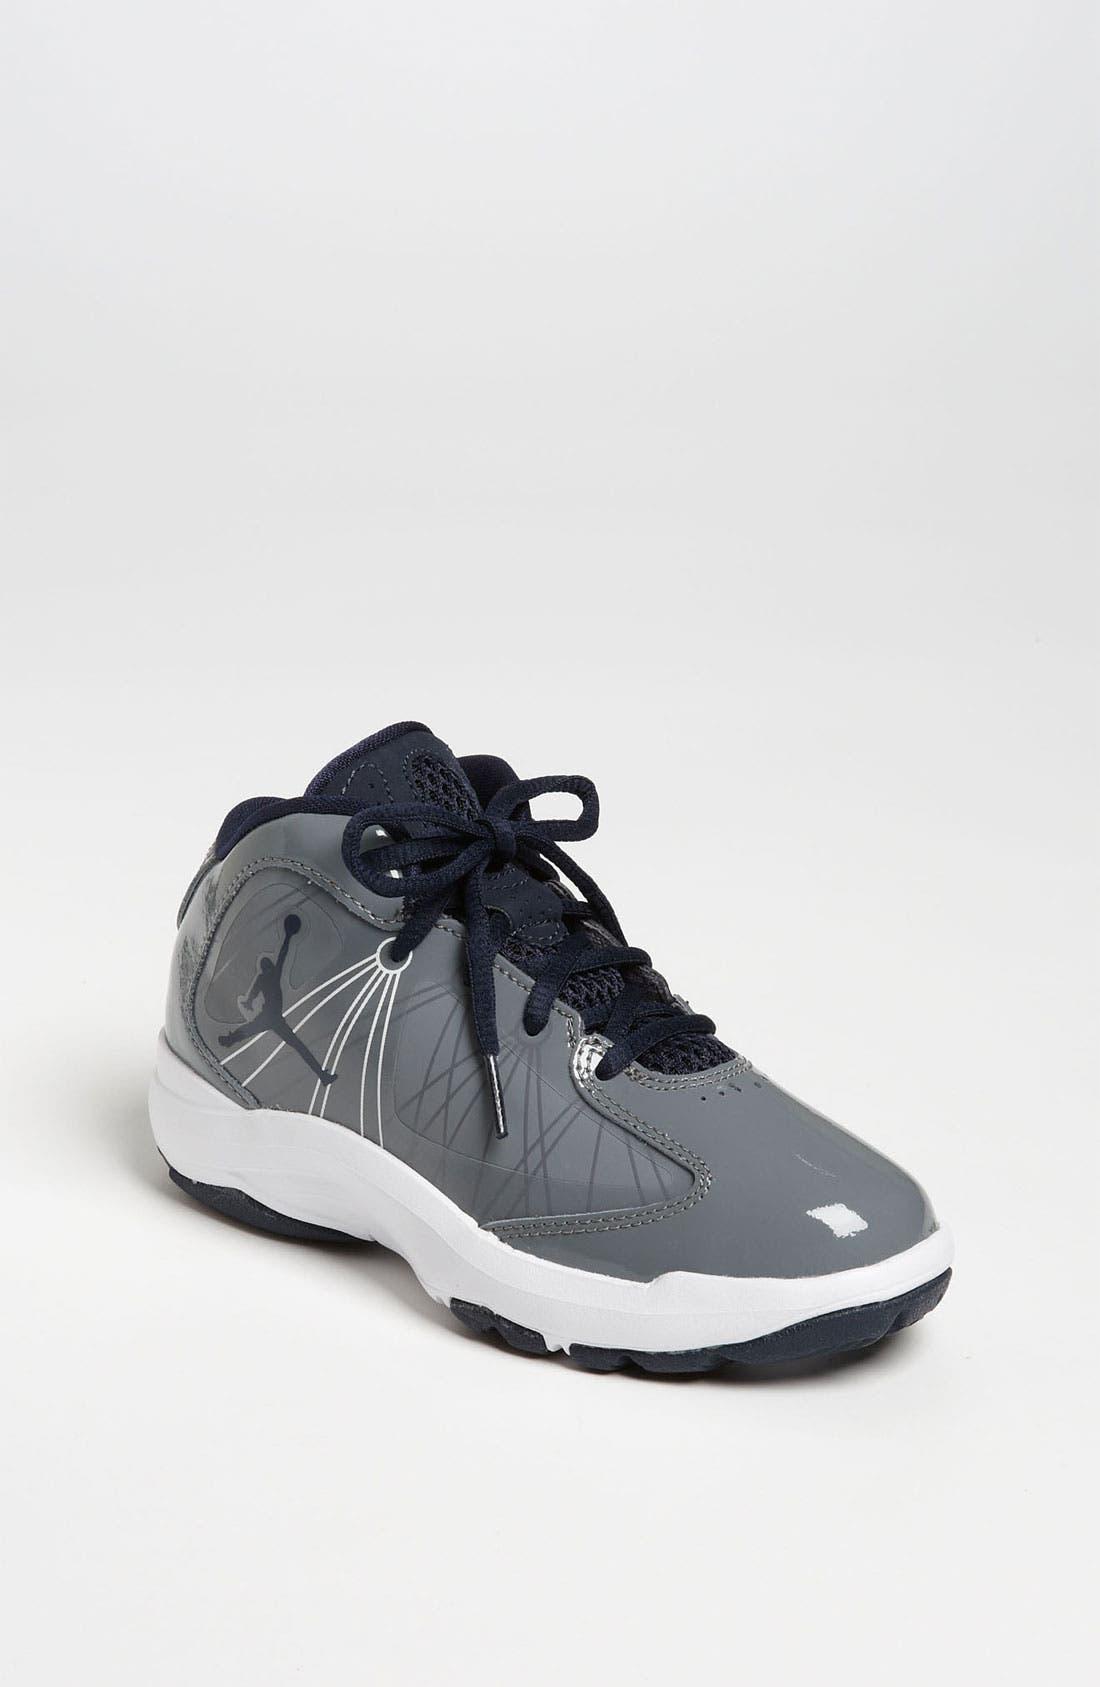 Main Image - Nike 'Jordan Aero Flight' Sneaker (Toddler & Little Kid)